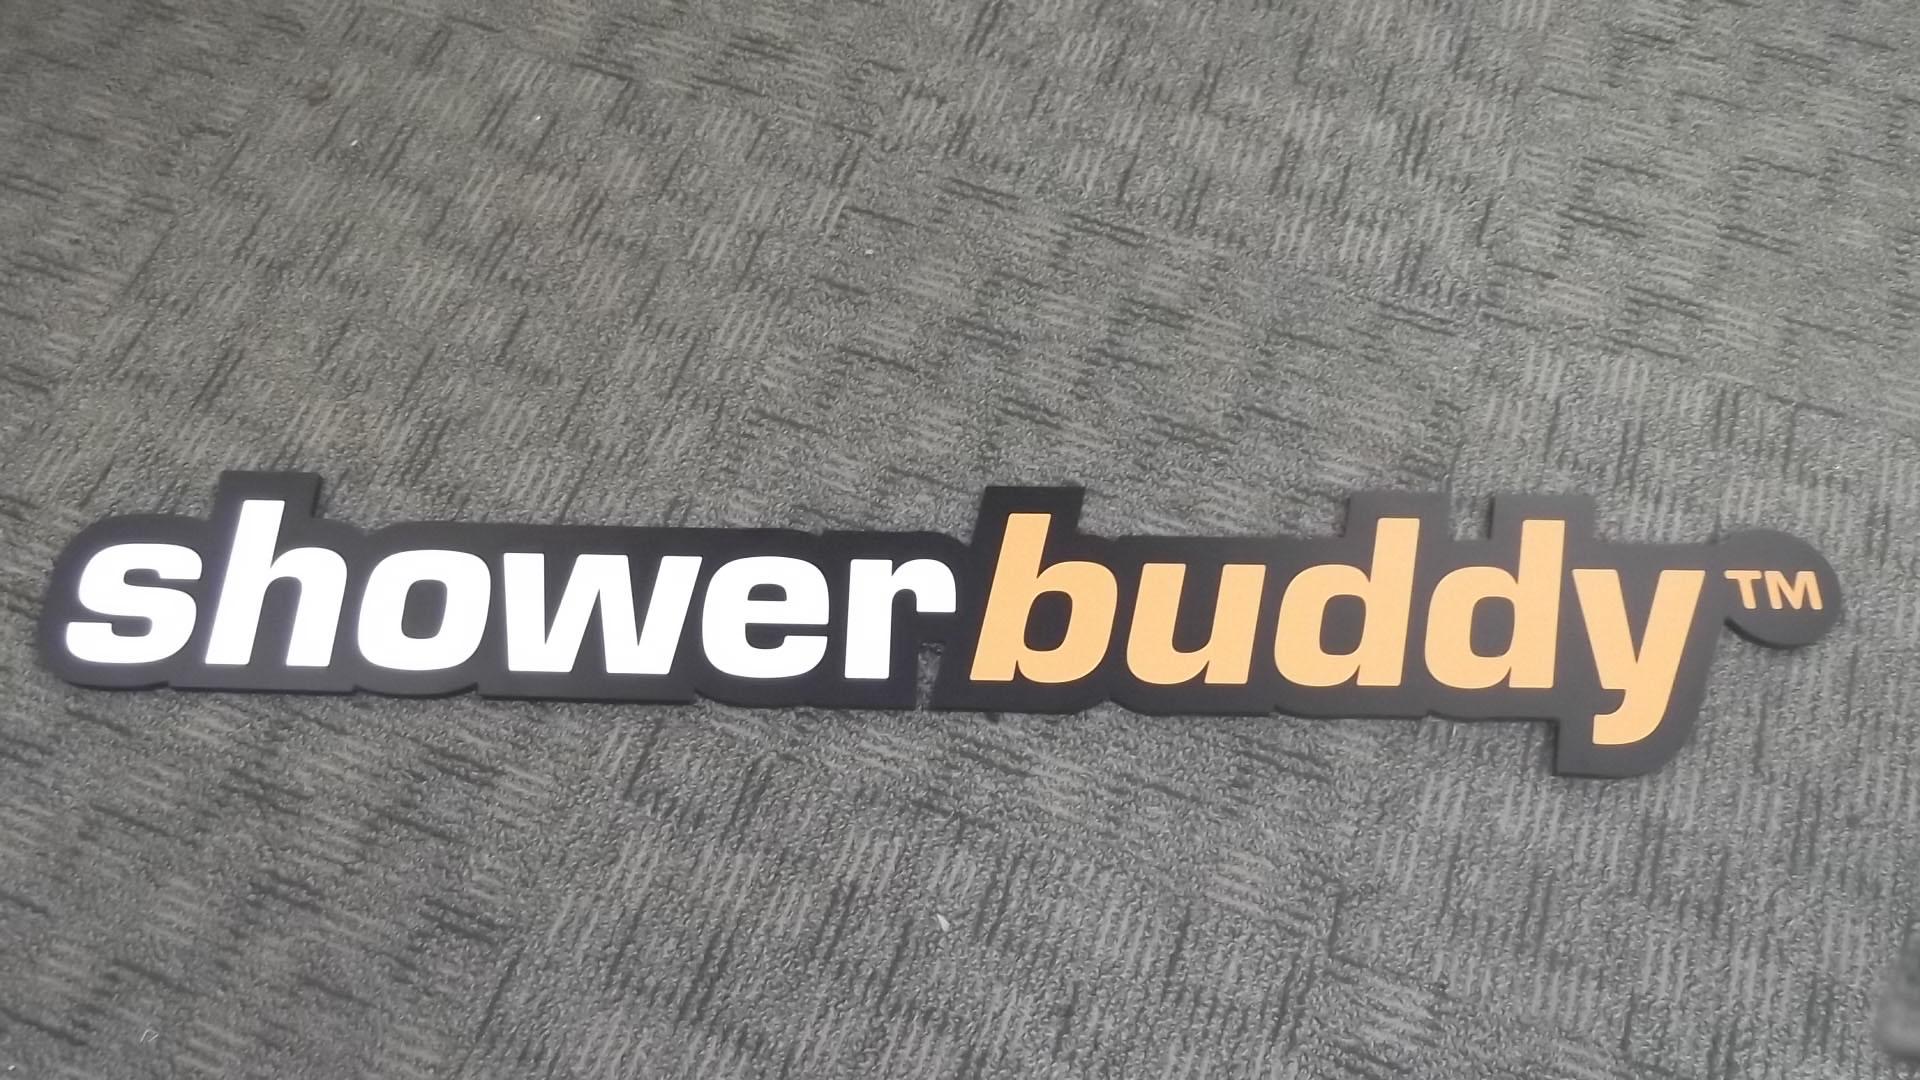 ShowerBuddy PVC Sign